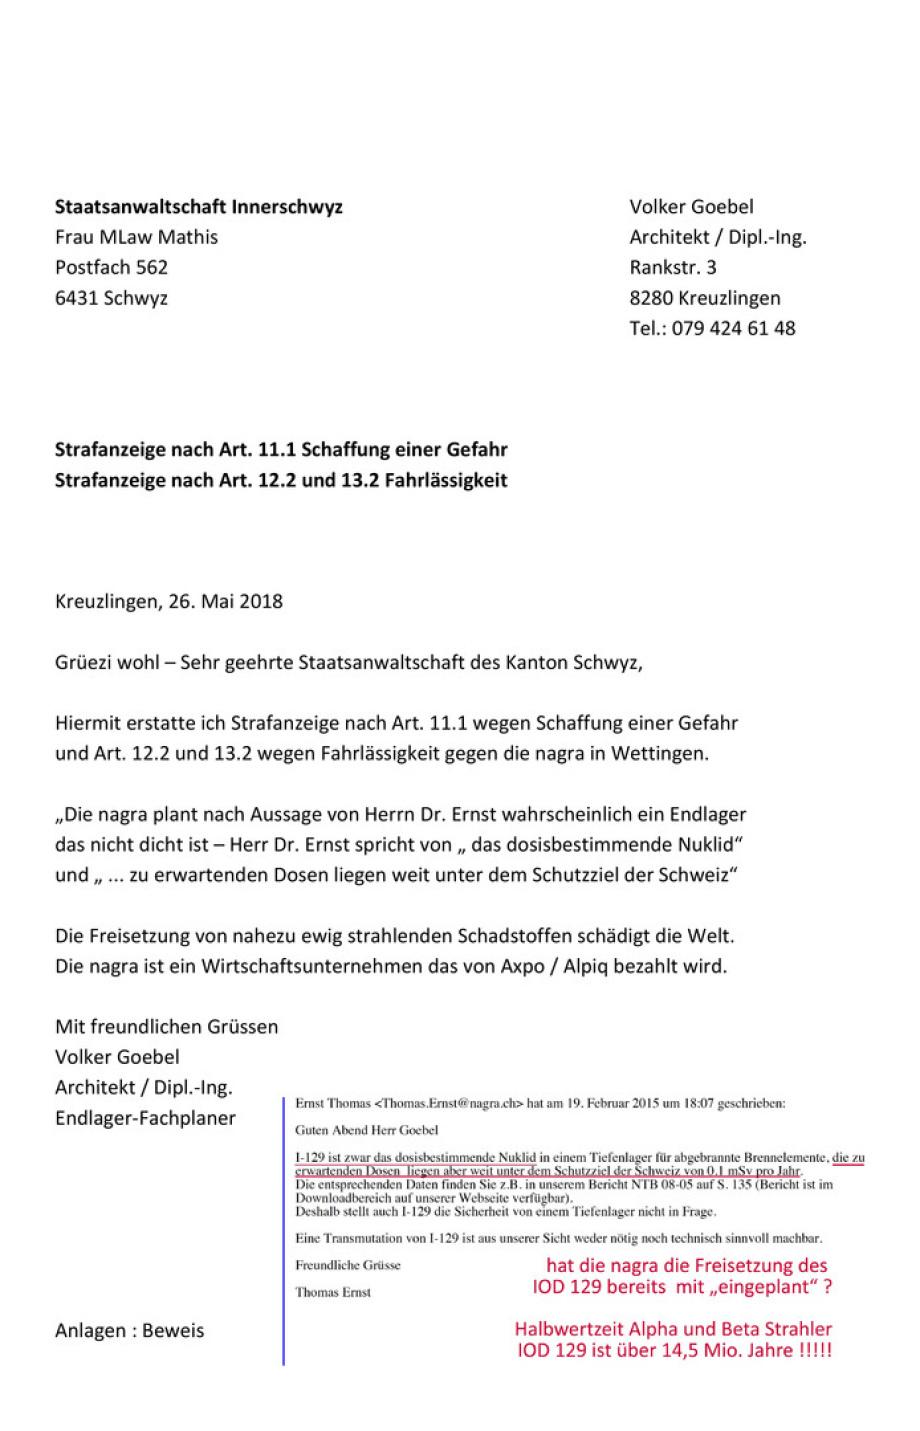 Strafanzeige_01_nagra Wettingen_Staatsanwaltschaft des Kanton Schwyz Volker Goebel